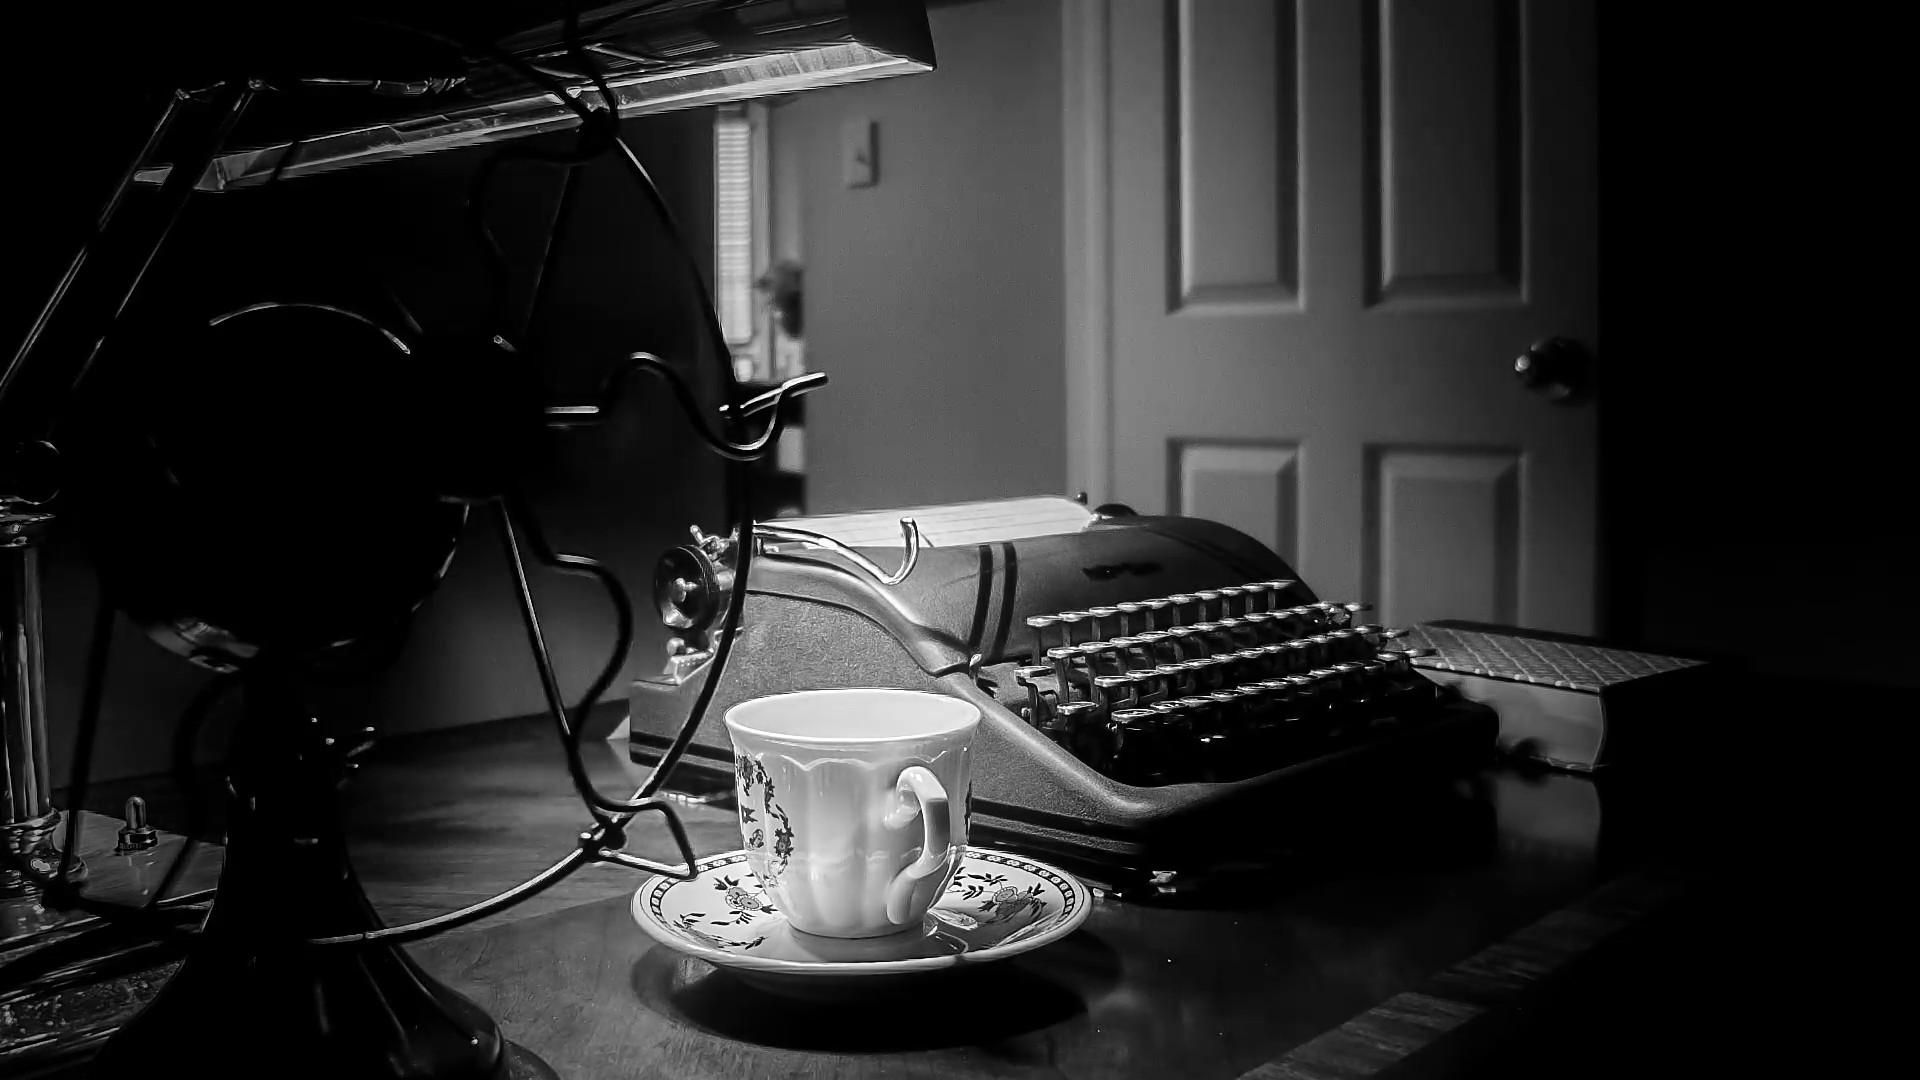 film noir shot of old fan and typewriter. Stock Video Footage – VideoBlocks